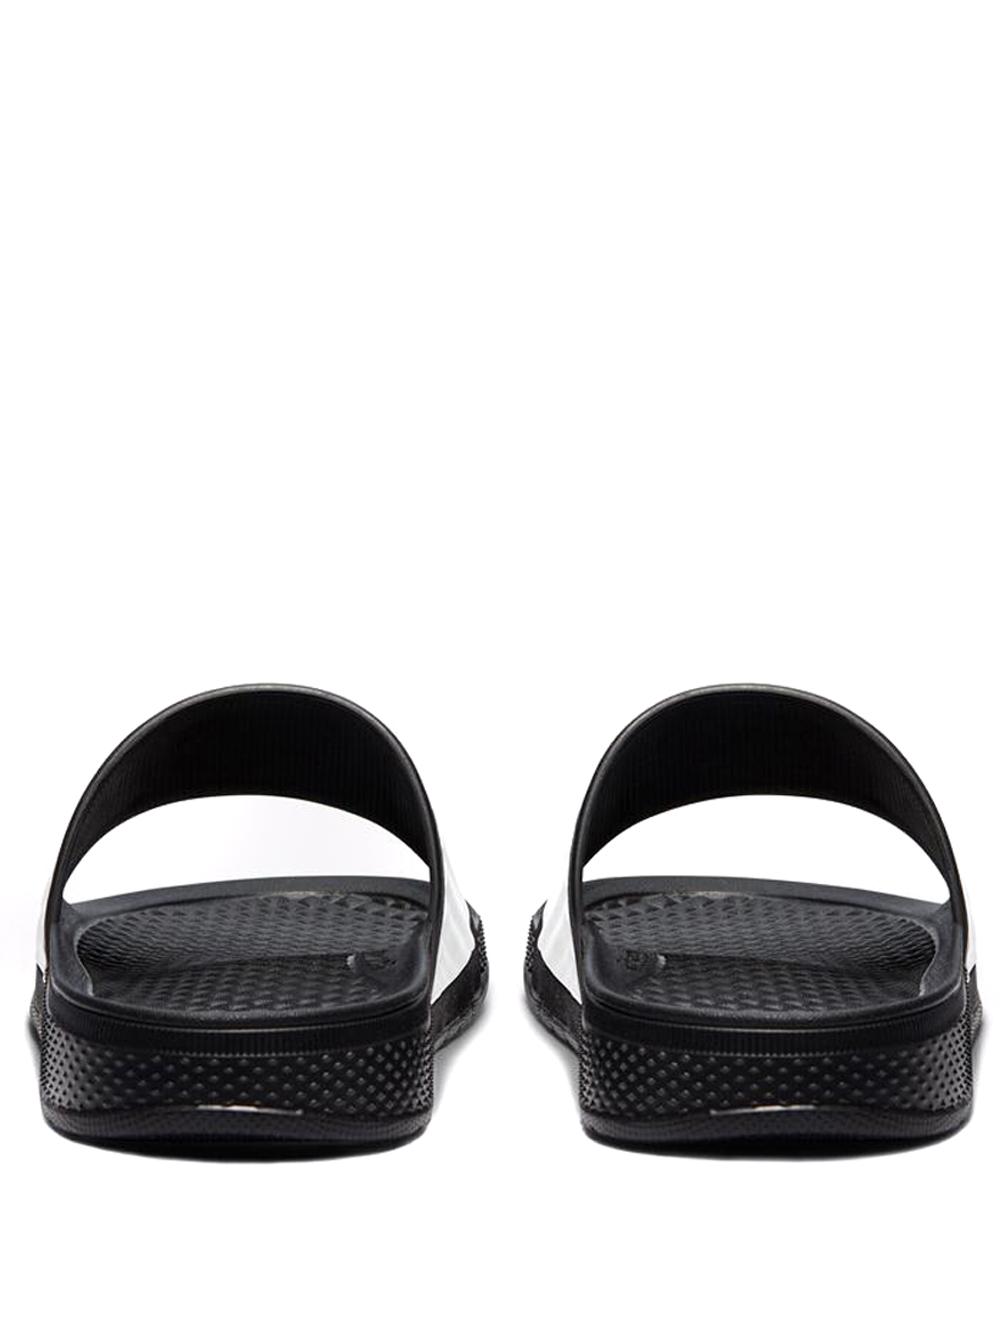 telfar slide man black in rubber CONVERSE X TELFAR | Sandals | 172316CBWR